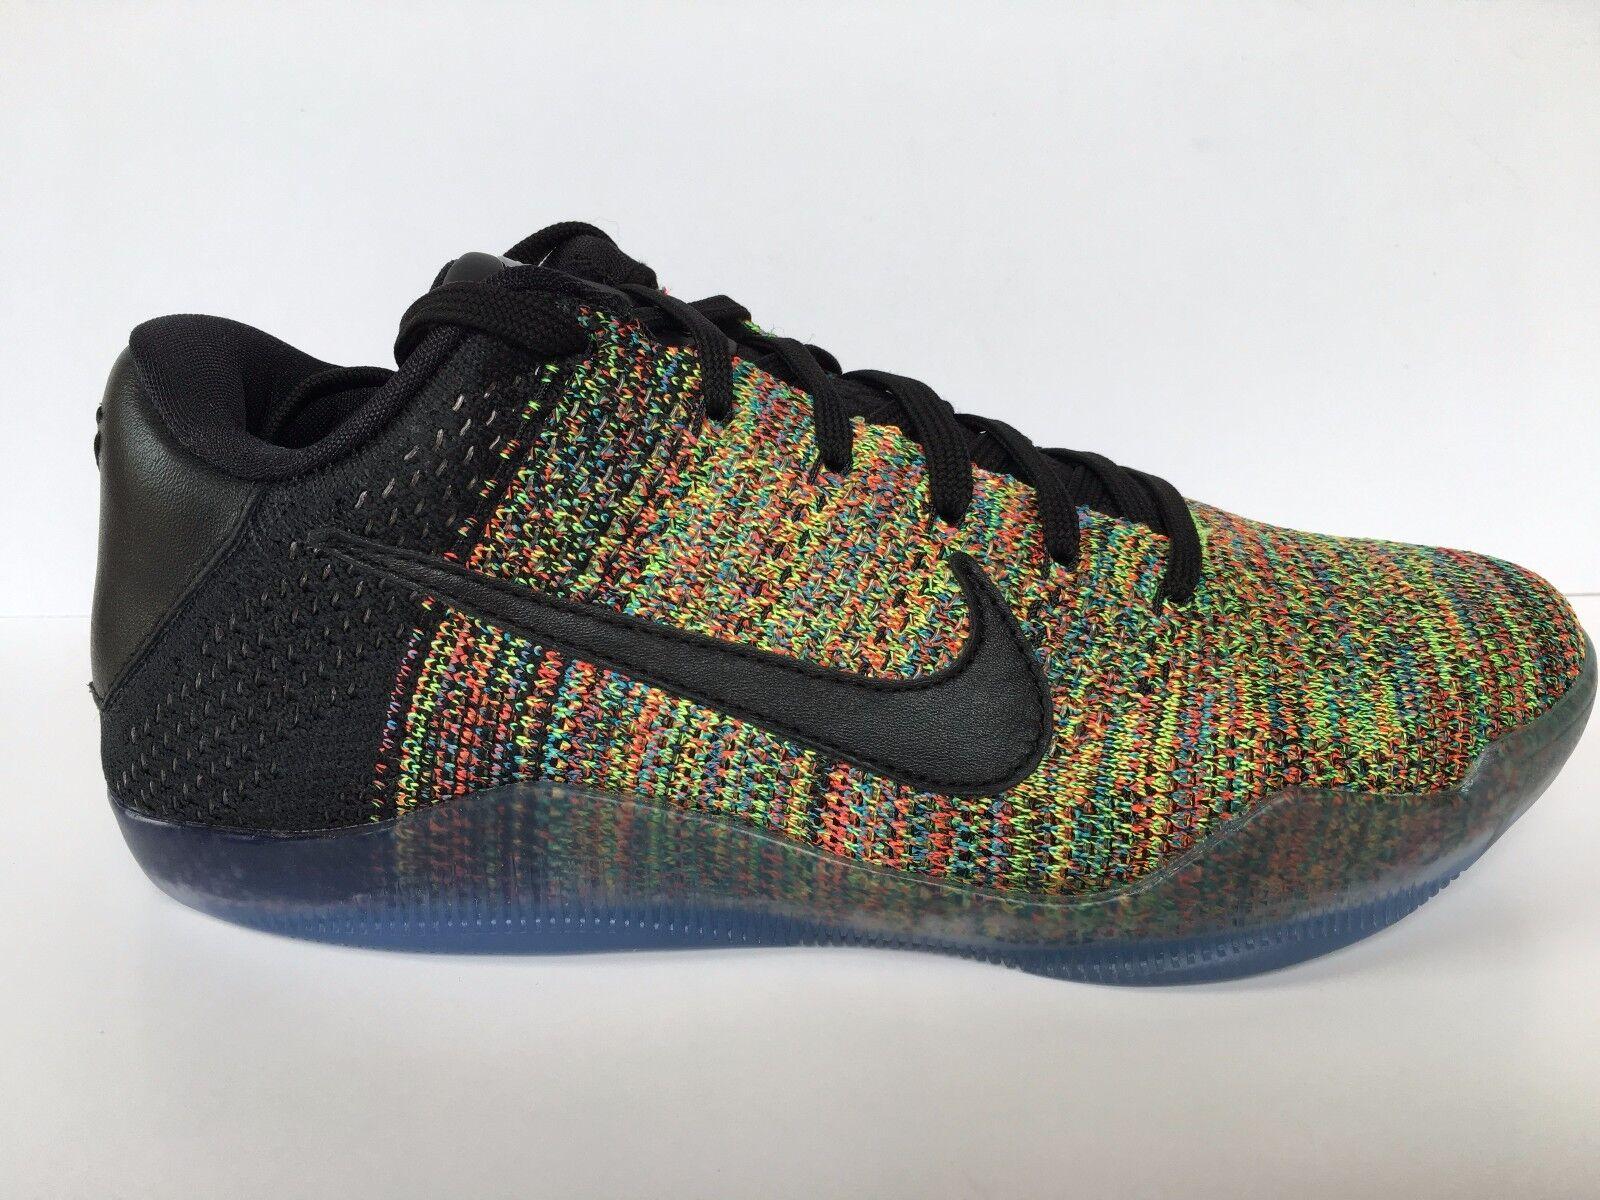 low priced cbcab 2f5b2 ... Nike Kobe XI Elite Low Flyknit iD Multicolor Multicolor Multicolor 2016  Men SZ 8  903710 ...